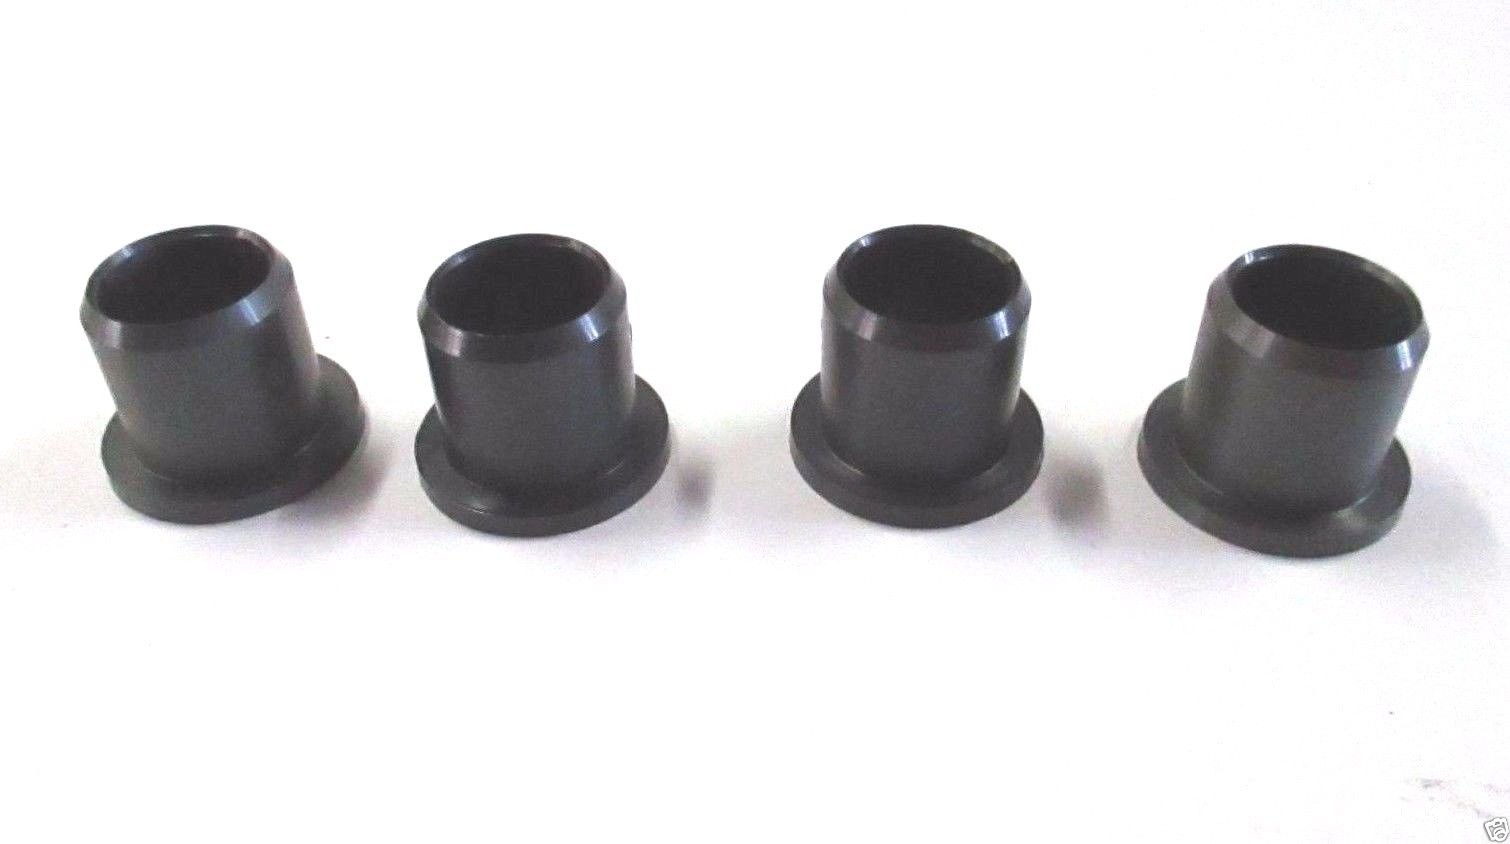 4 Genuine MTD 741-0660A Flange Bearing Fits Bolens Craftsman Troy-Bilt White OEM